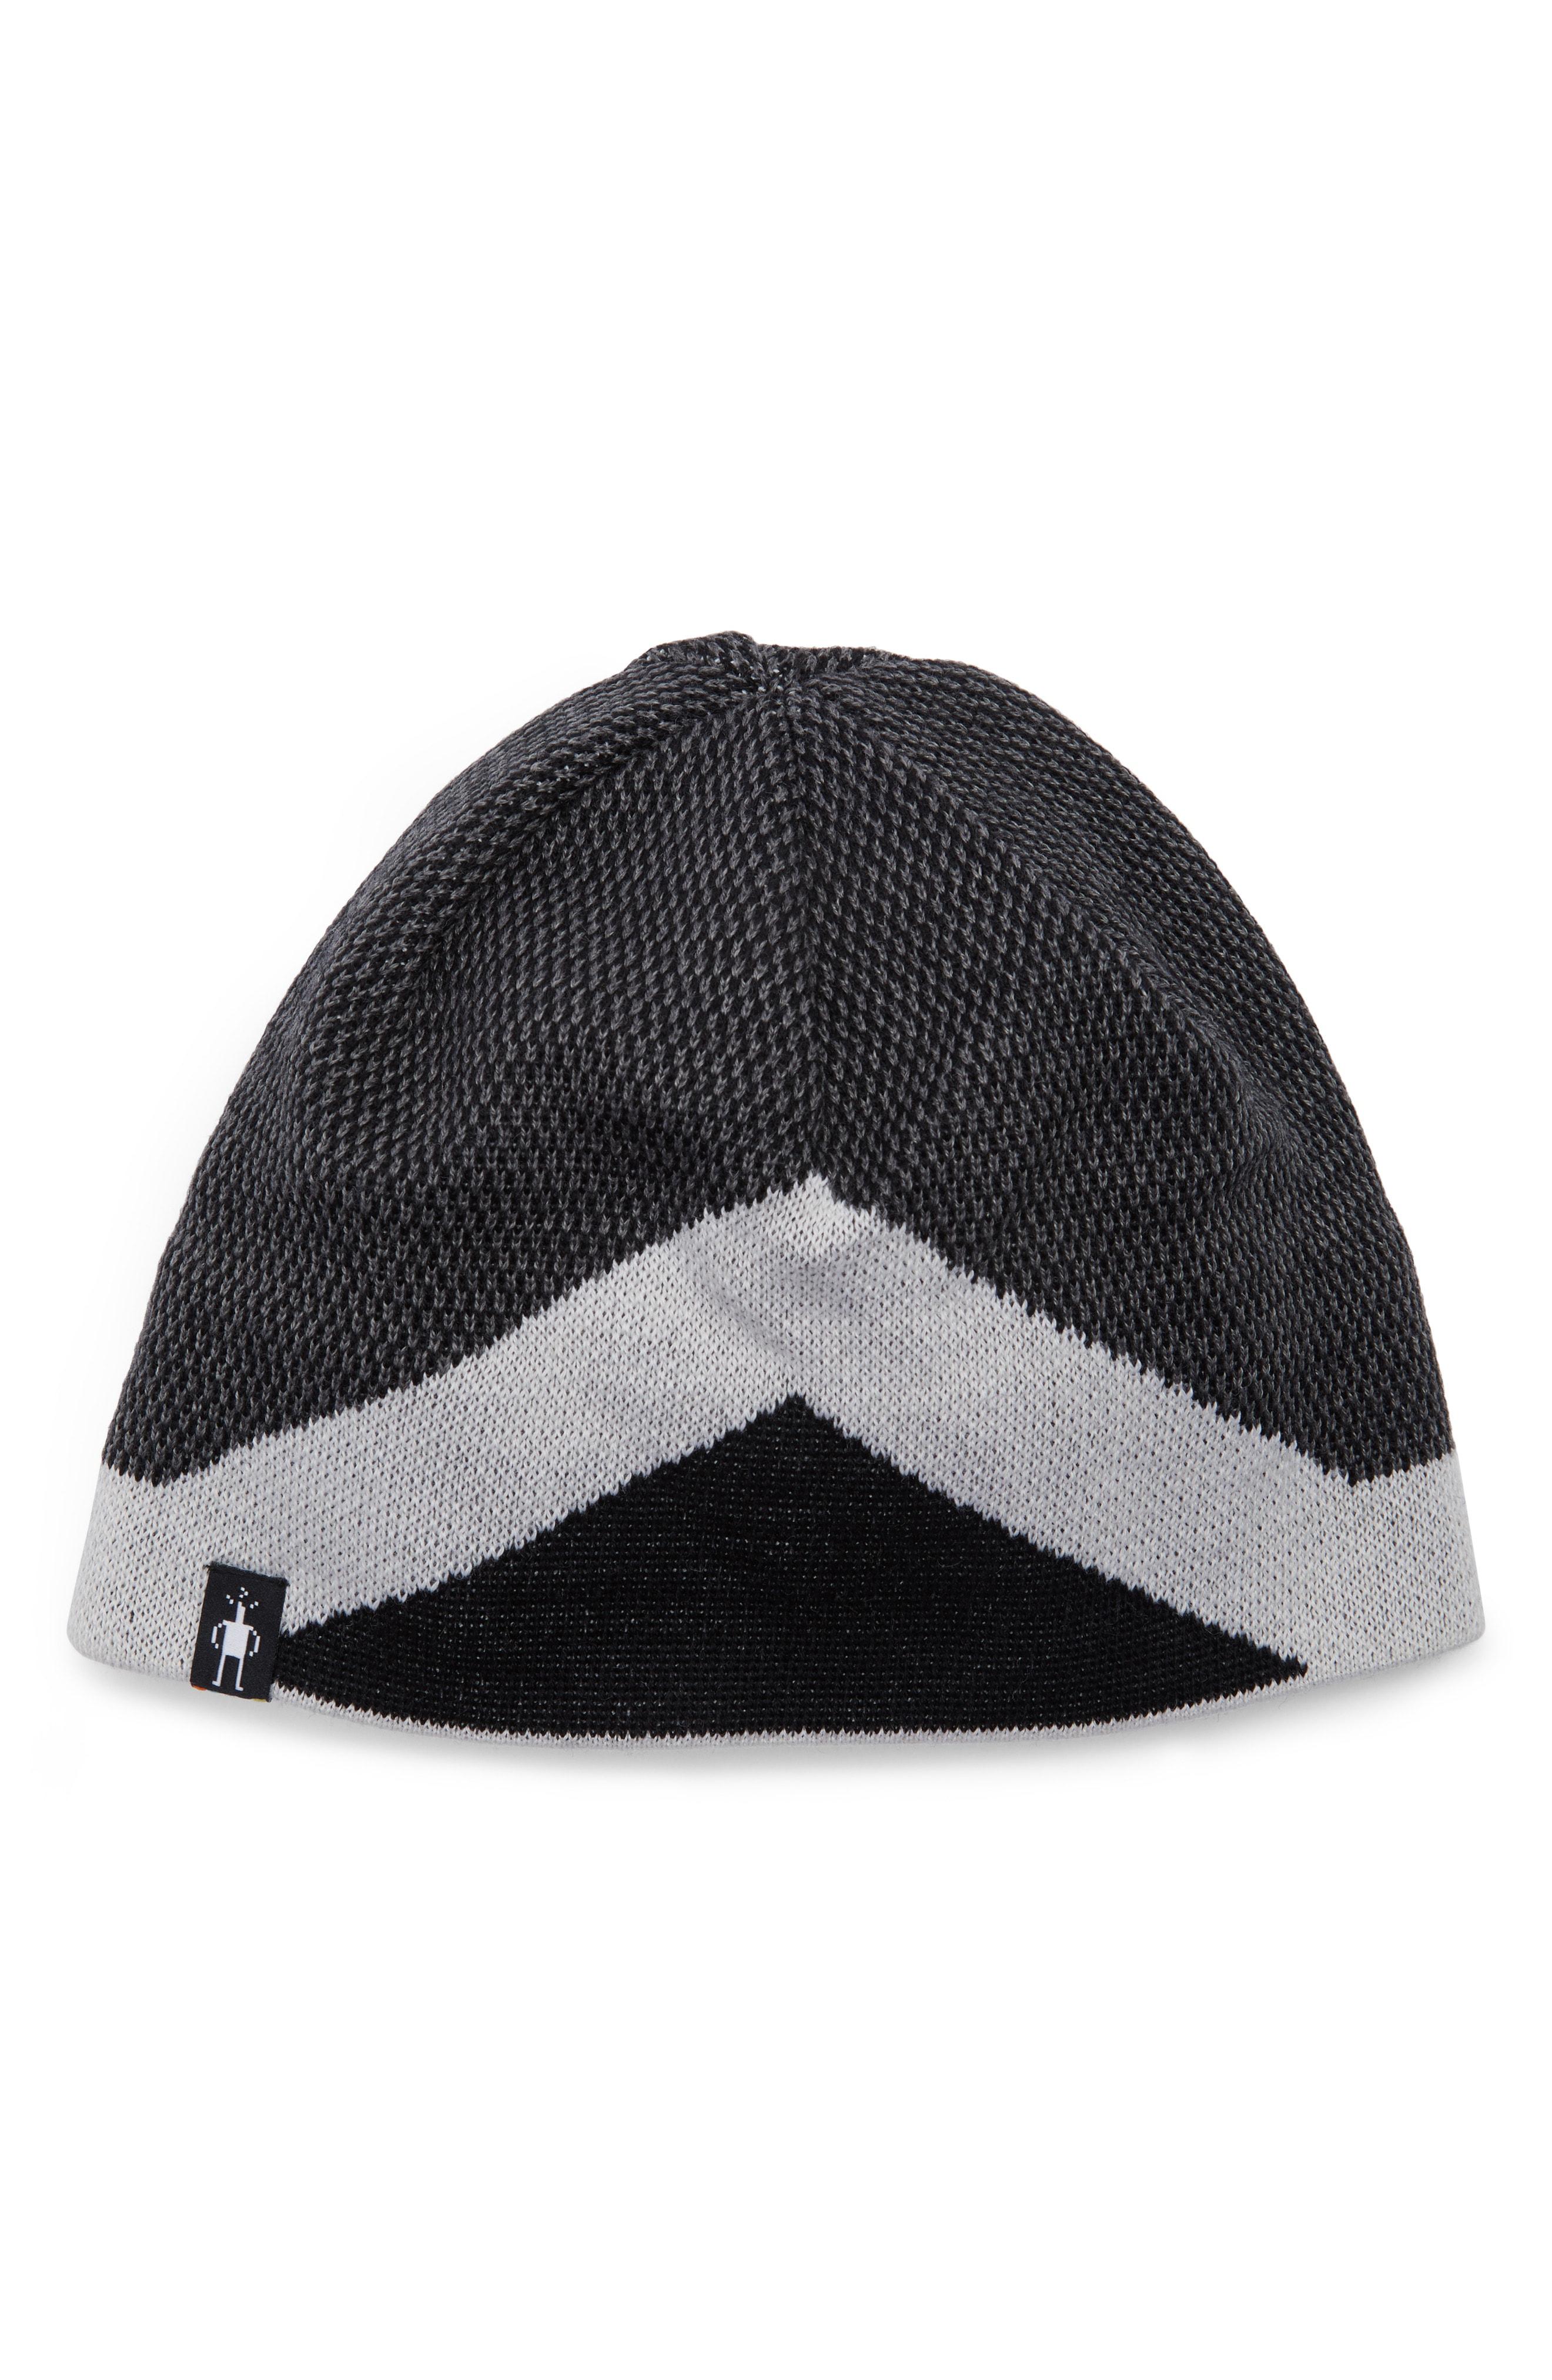 Smartwool Jacquard Ski Hat